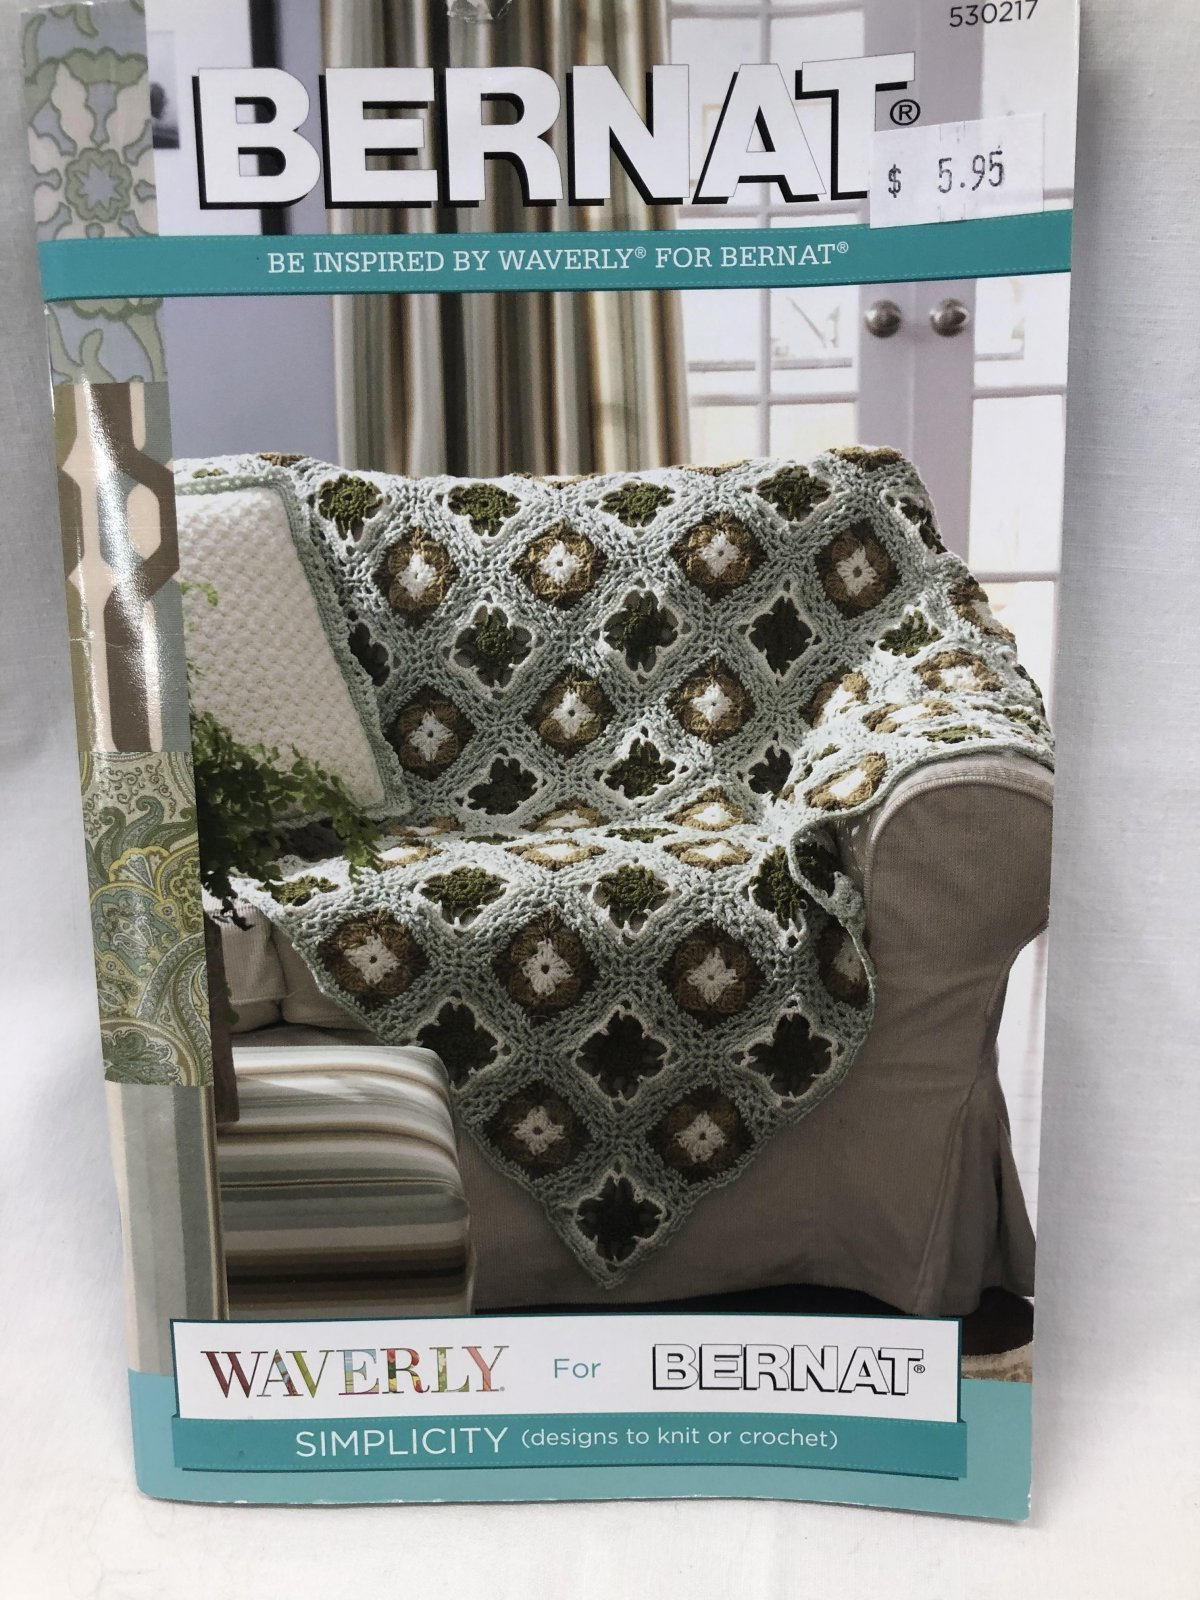 Bernat Simplicity (designs to knit or crochet)